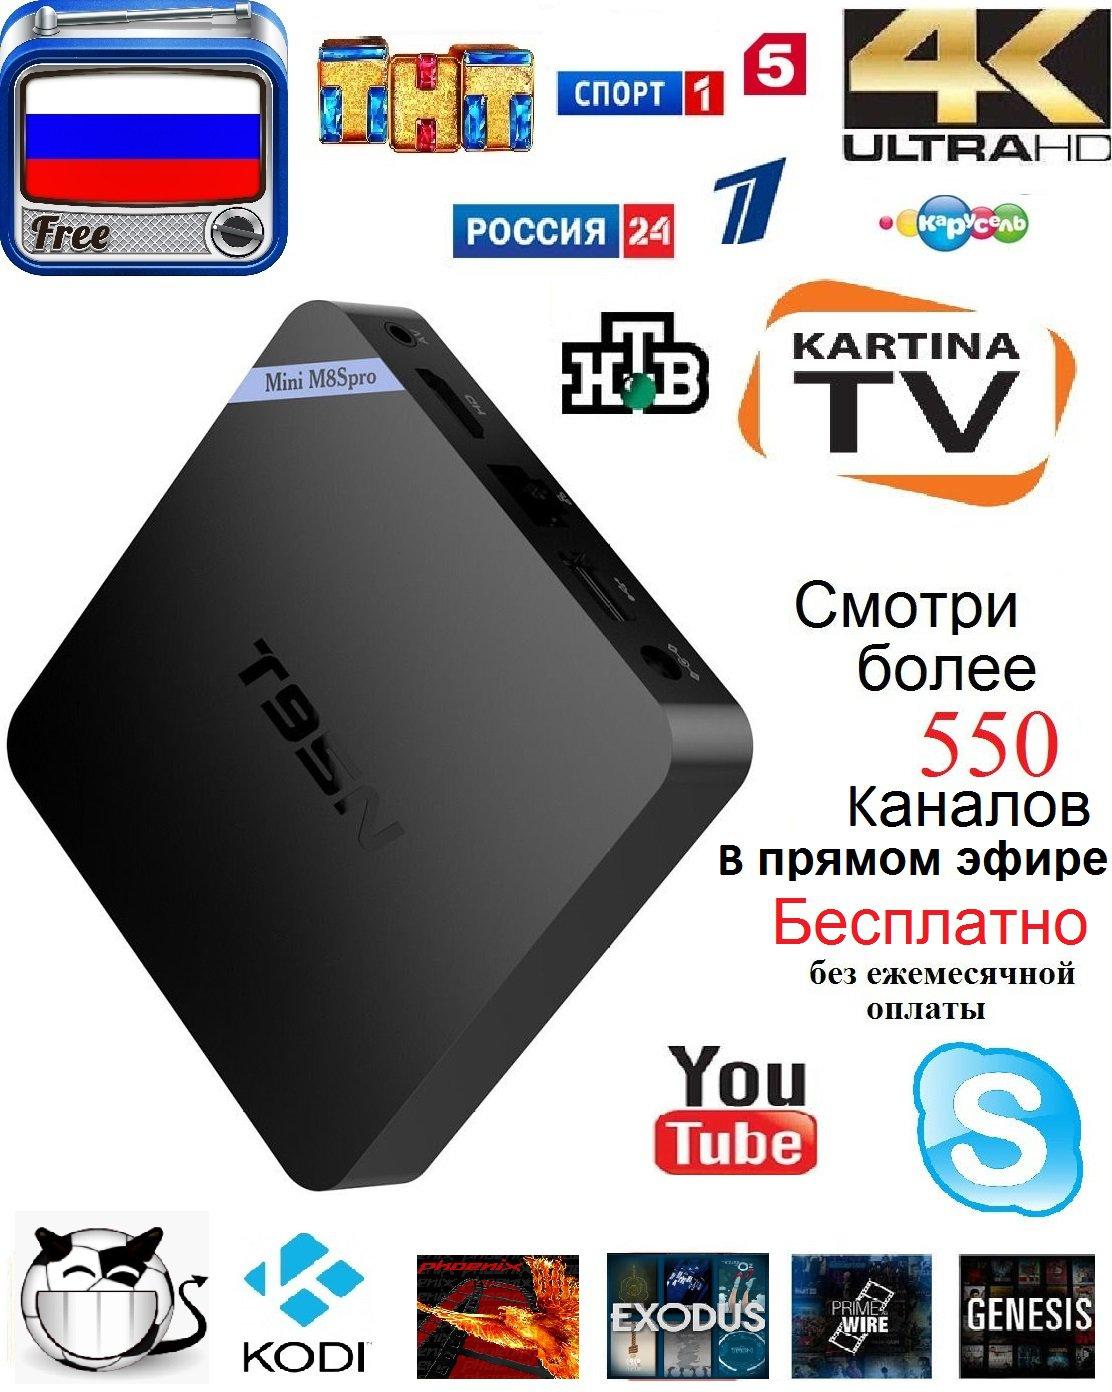 Live Russian TV Receiver Box T95n Mini 2G 8G Fast By TvBox.Pro Ukrainian TV Kartina TV